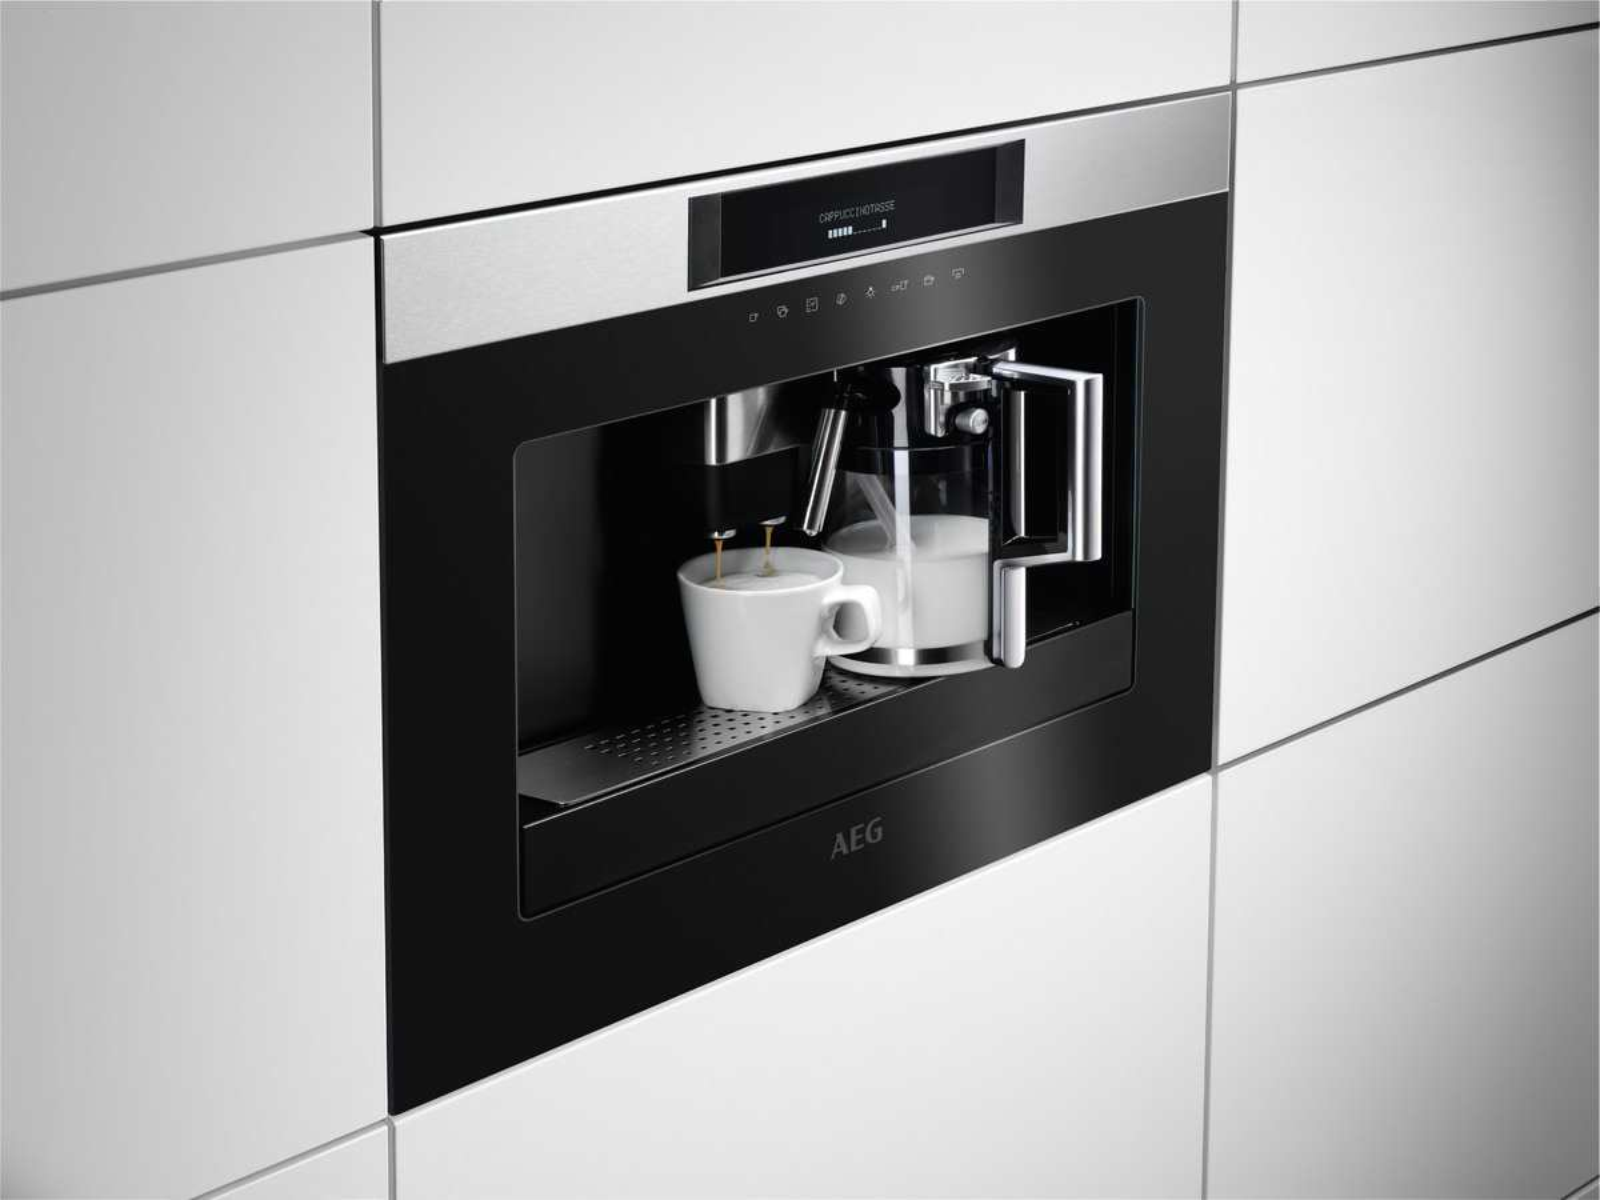 Aeg Kkk884500m Einbau Espresso Kaffeevollautomat Edelstahl